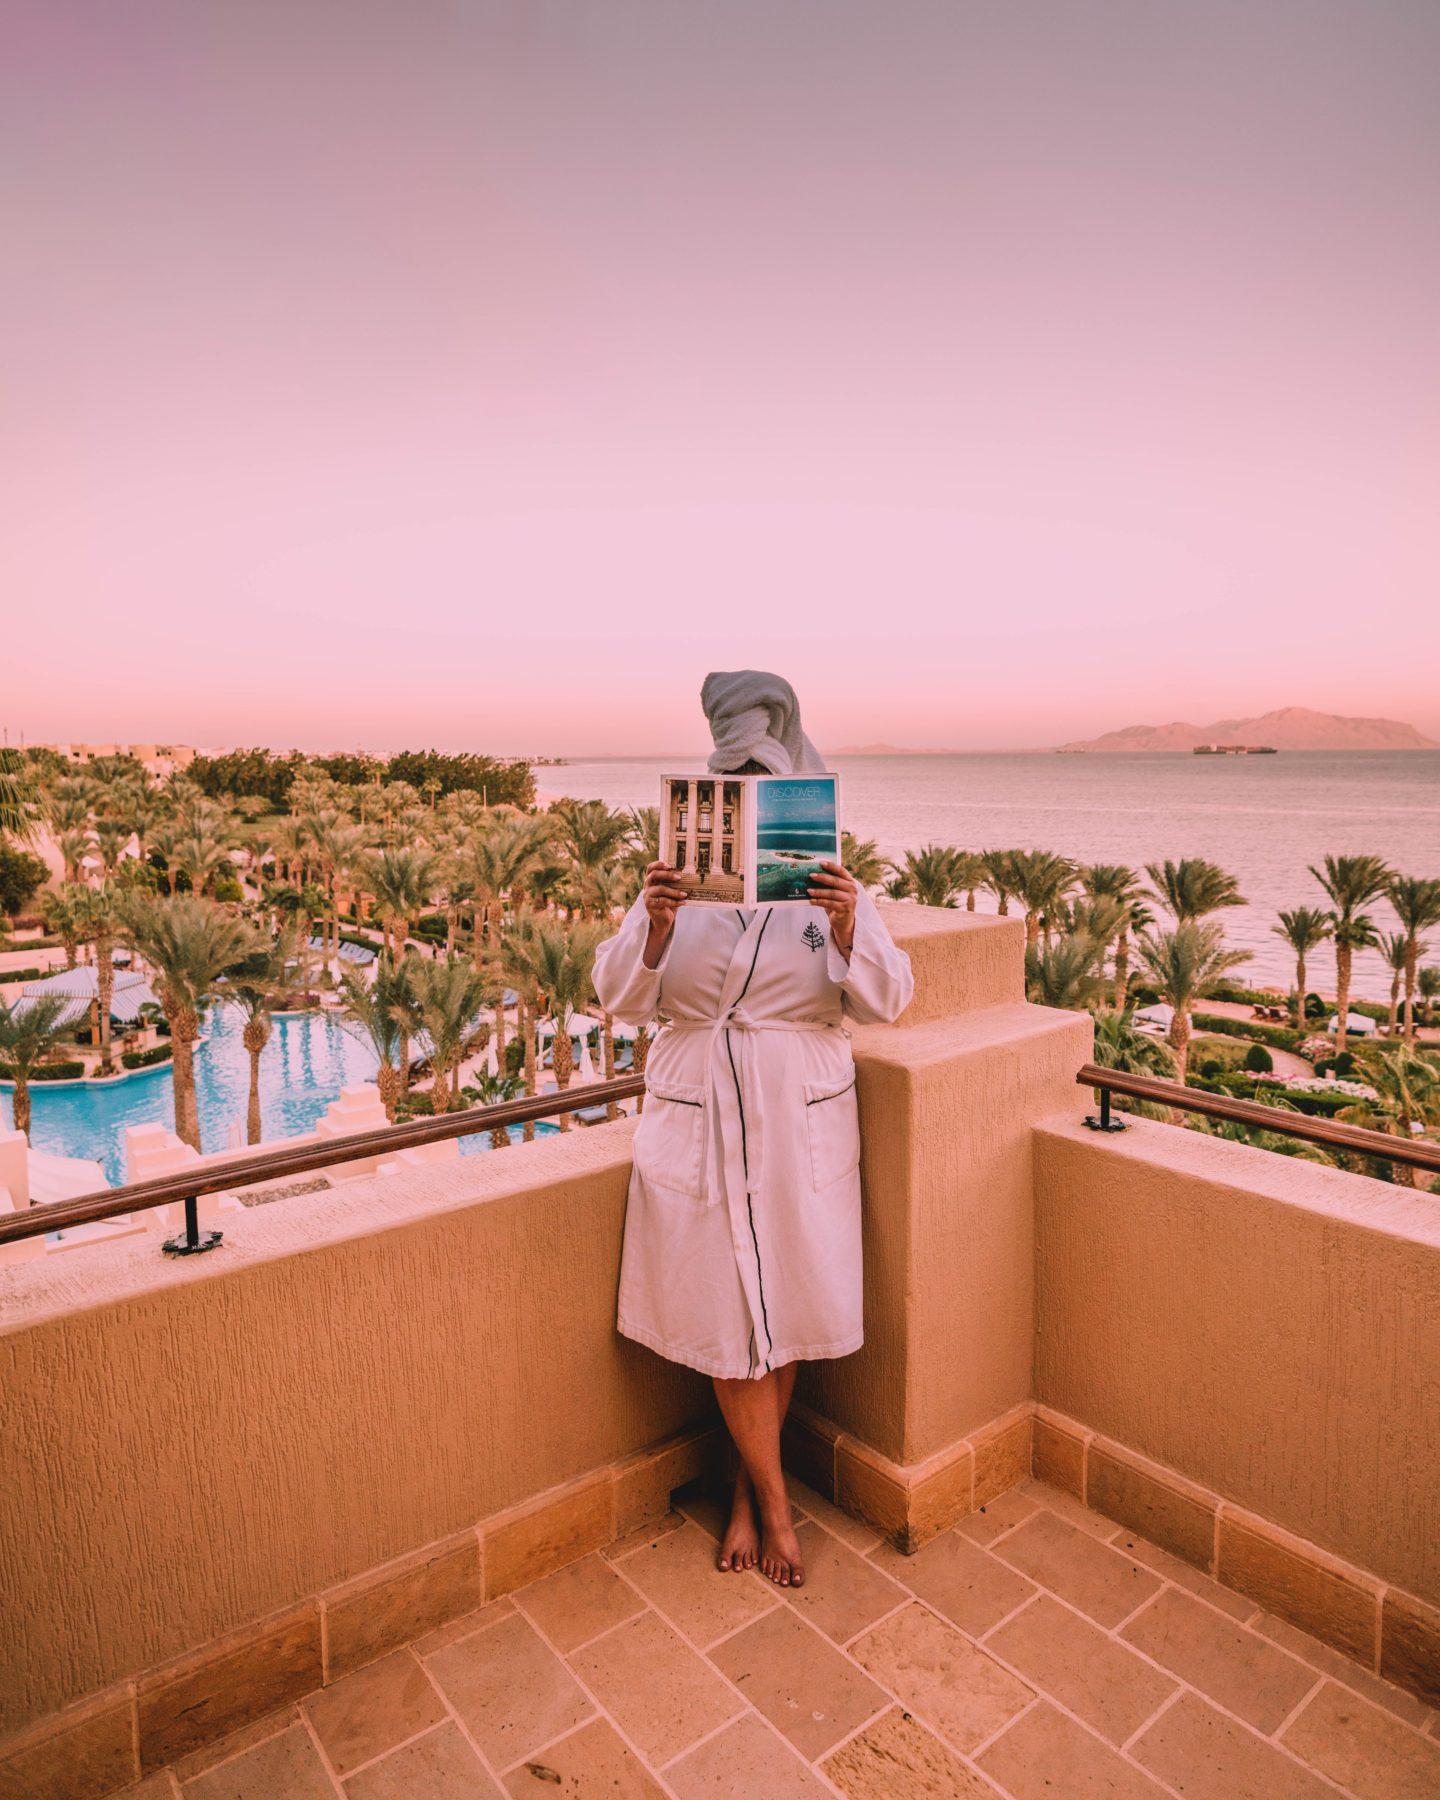 Four Seasons Sharm El Sheikh balcony with views of tiran island at sunset